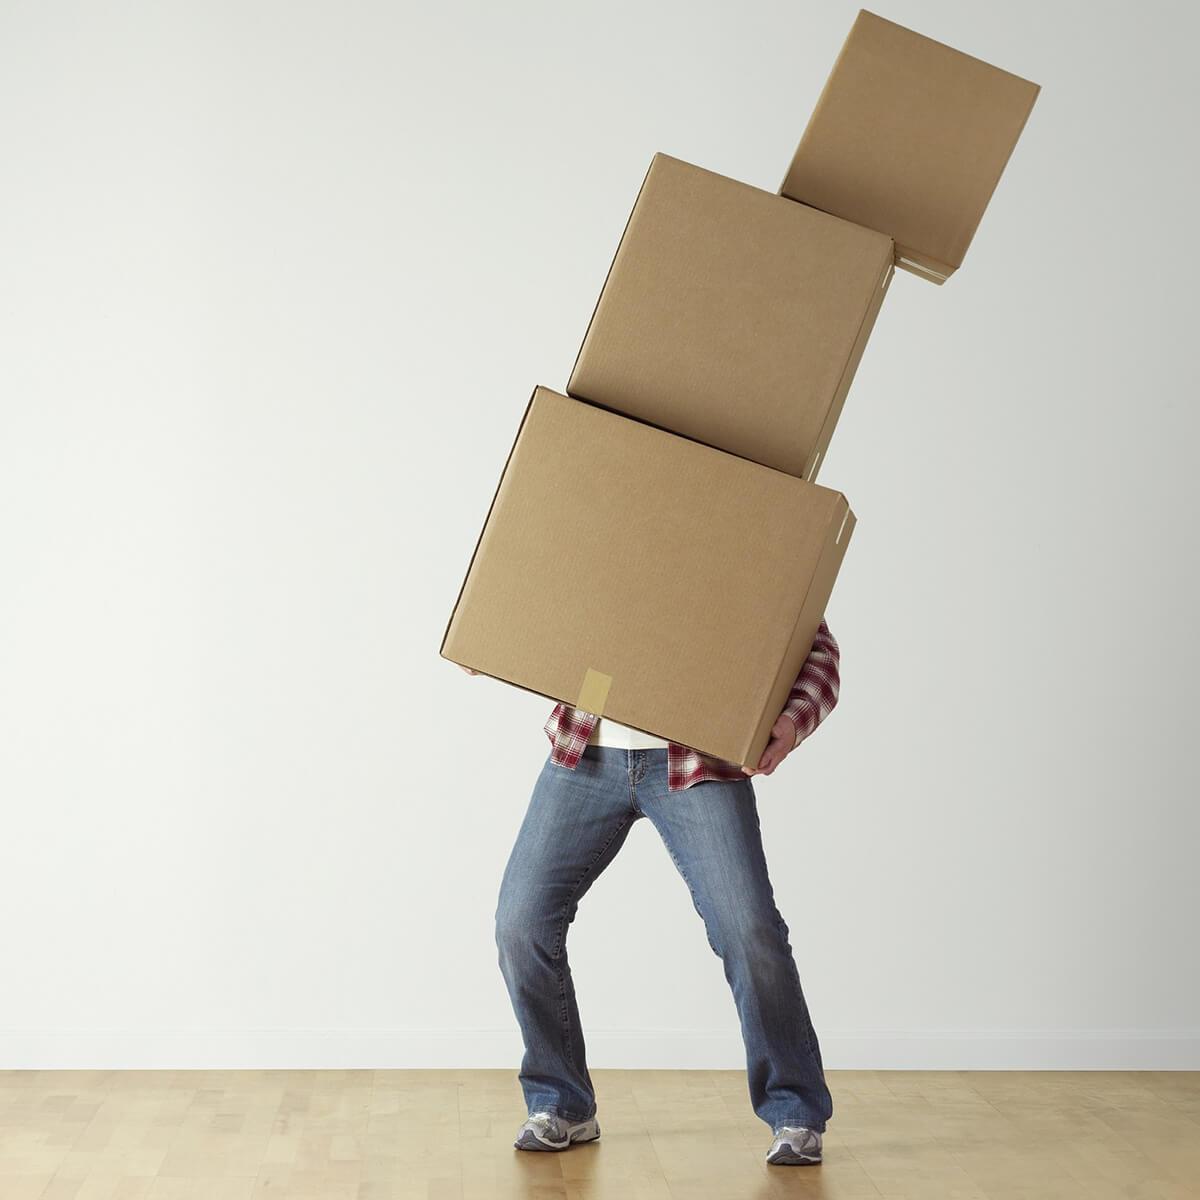 Stockage déménagement